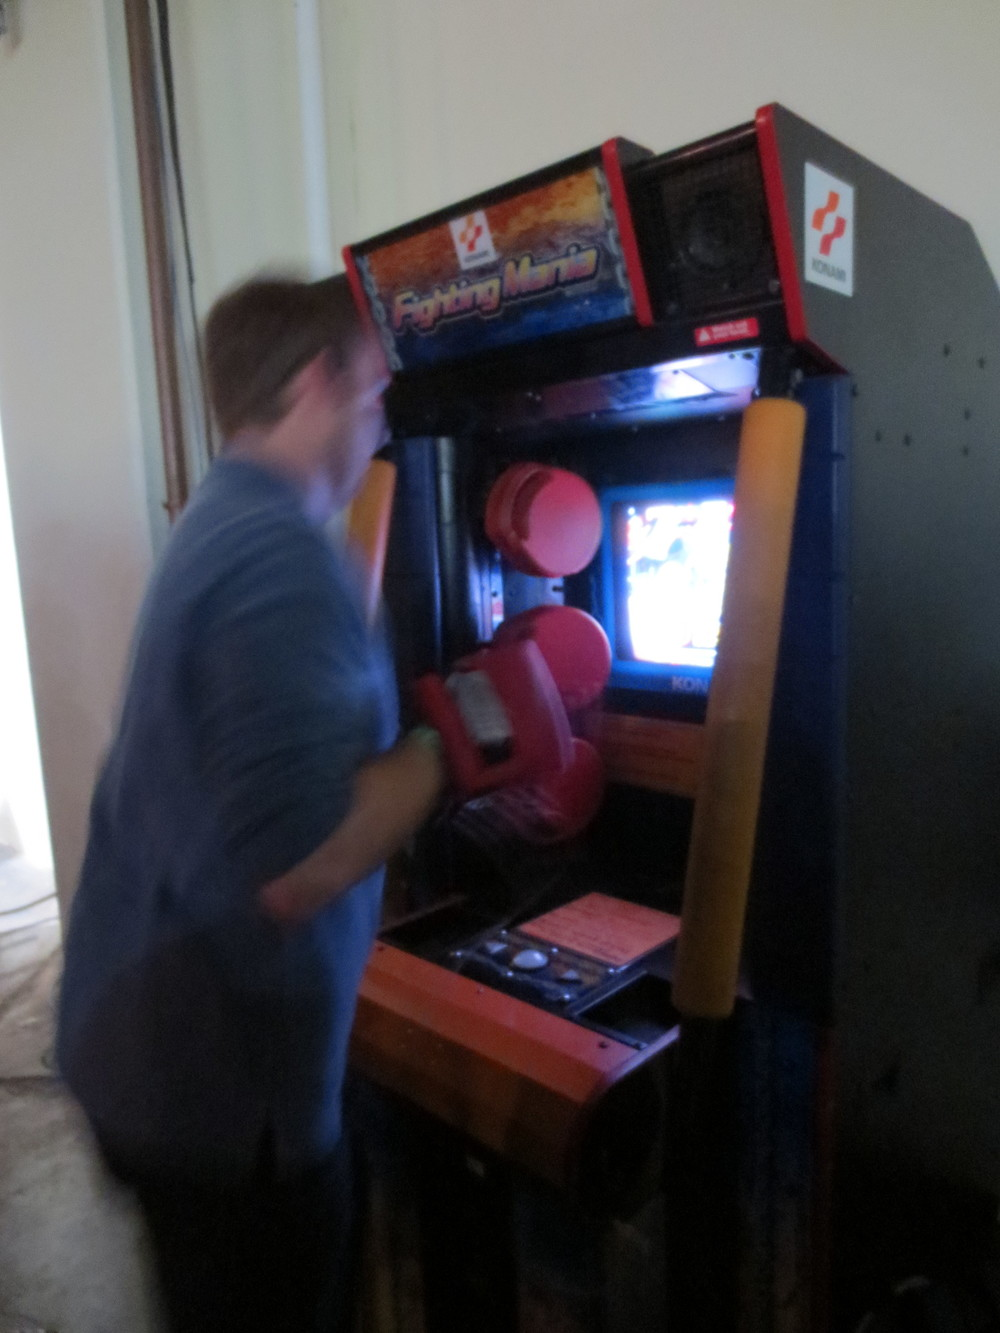 Brandon kicking butt in Fighting Mania